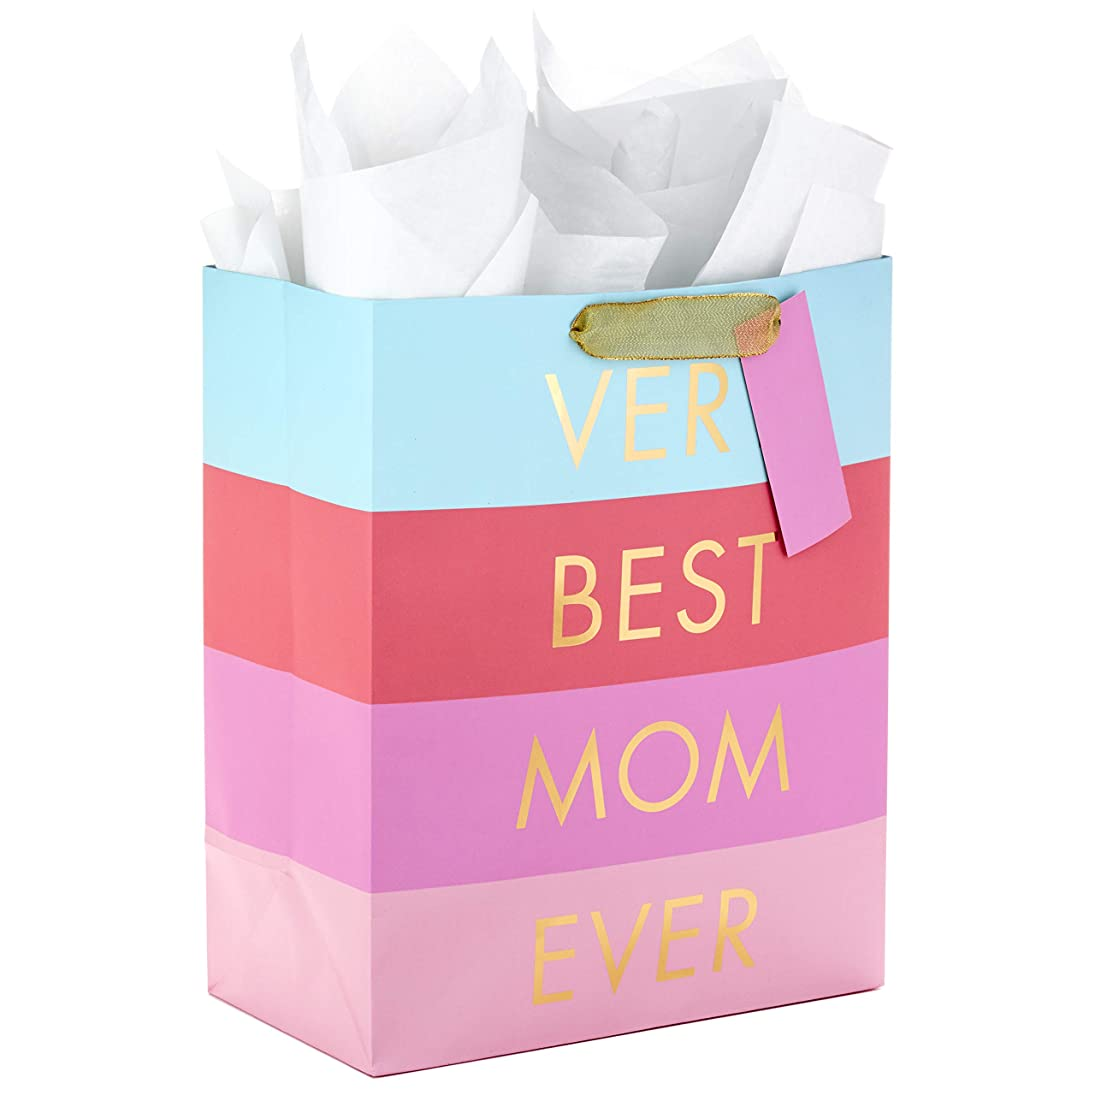 Hallmark Large Mother's Day Gift Bag with Tissue Paper (Very Best Mom Ever) krqqekbzrrp783